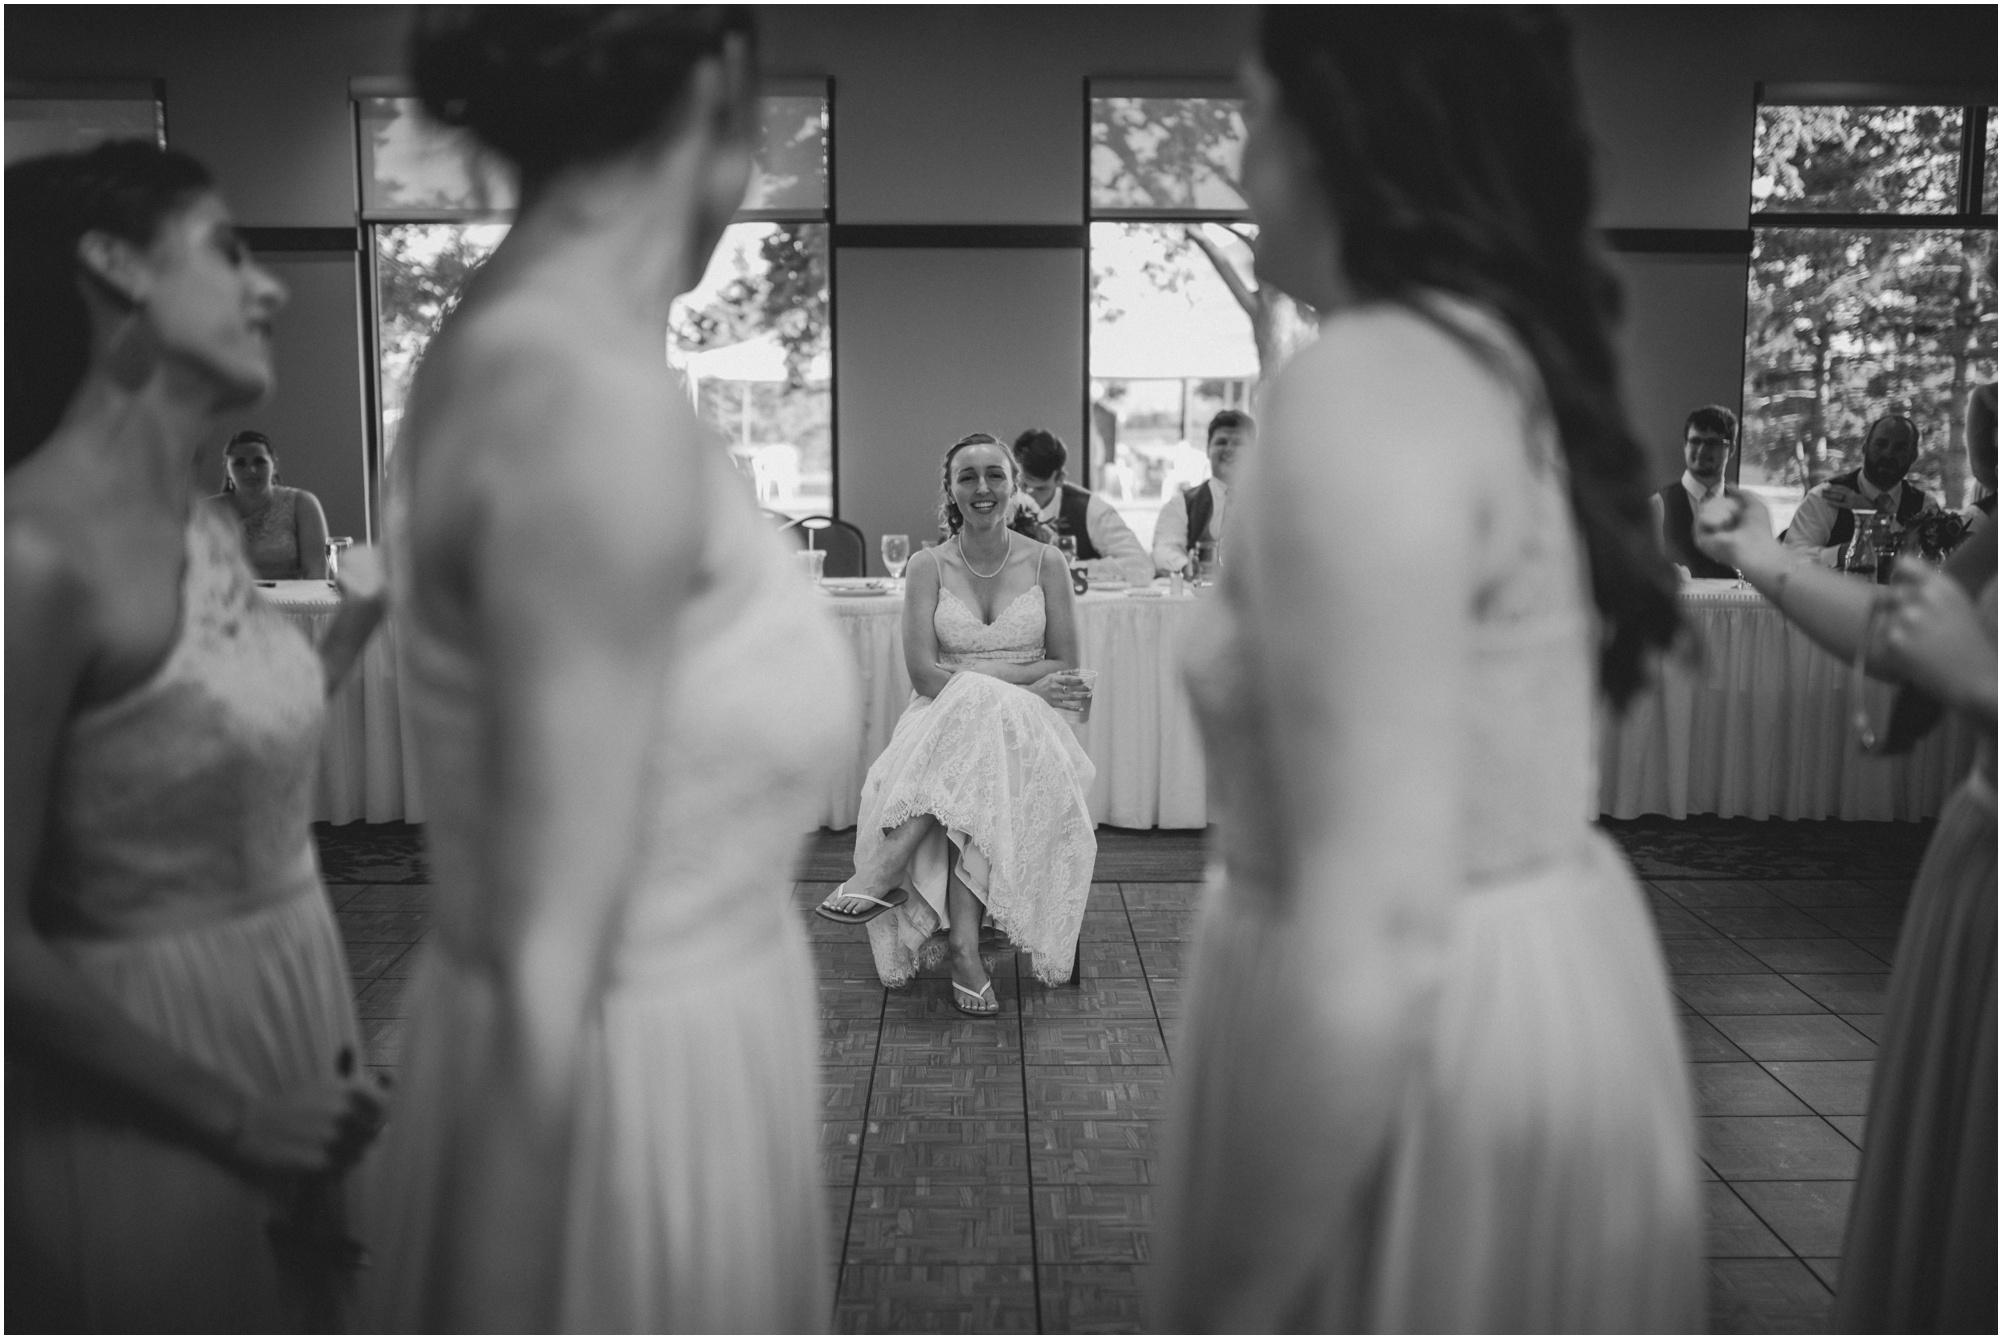 Wisconsin-Wedding-Photographer-Reedsburg-Country-Club-Kaela-and Matt-Wedding-802.jpg